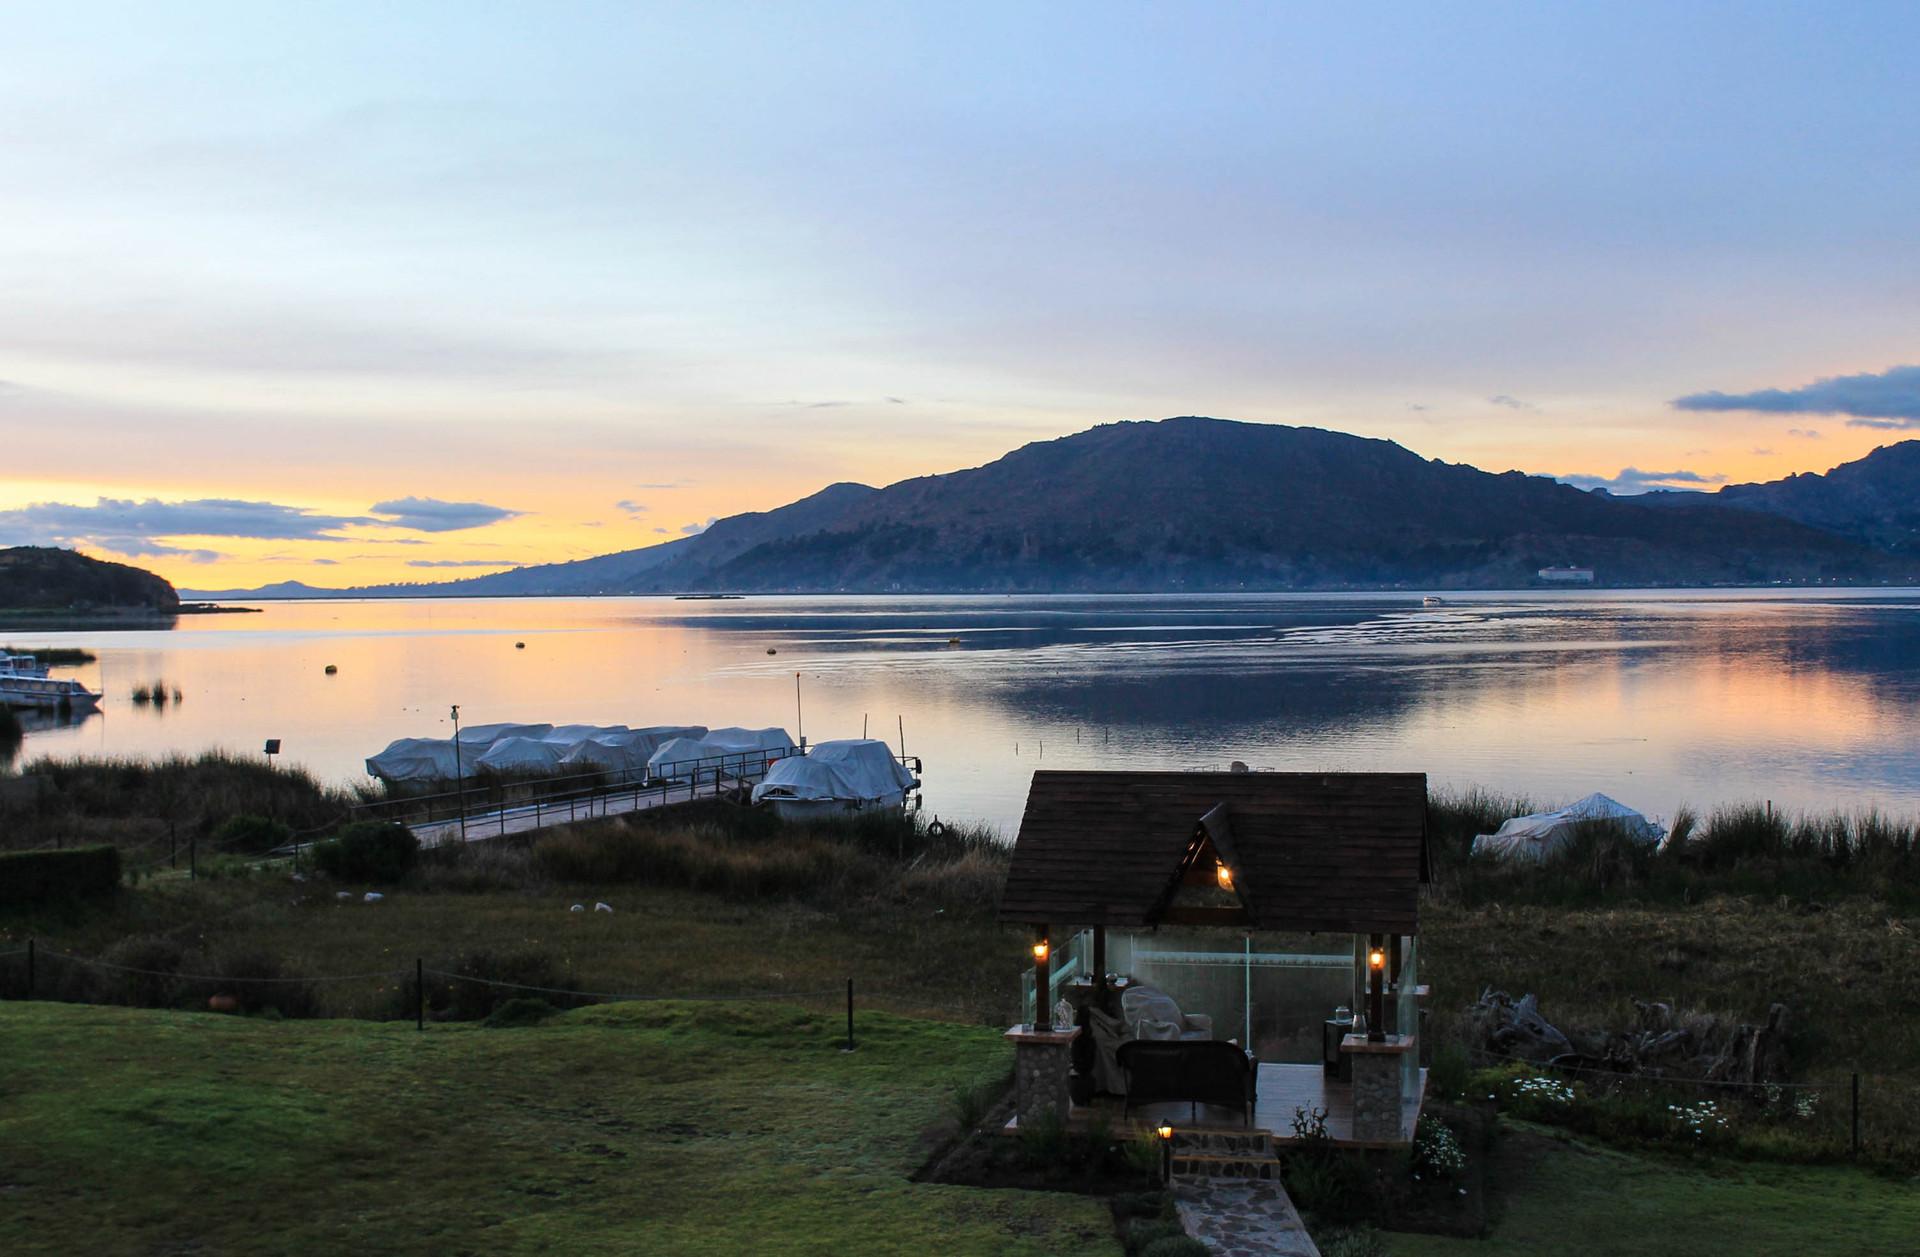 Puno - Lake Titicaca